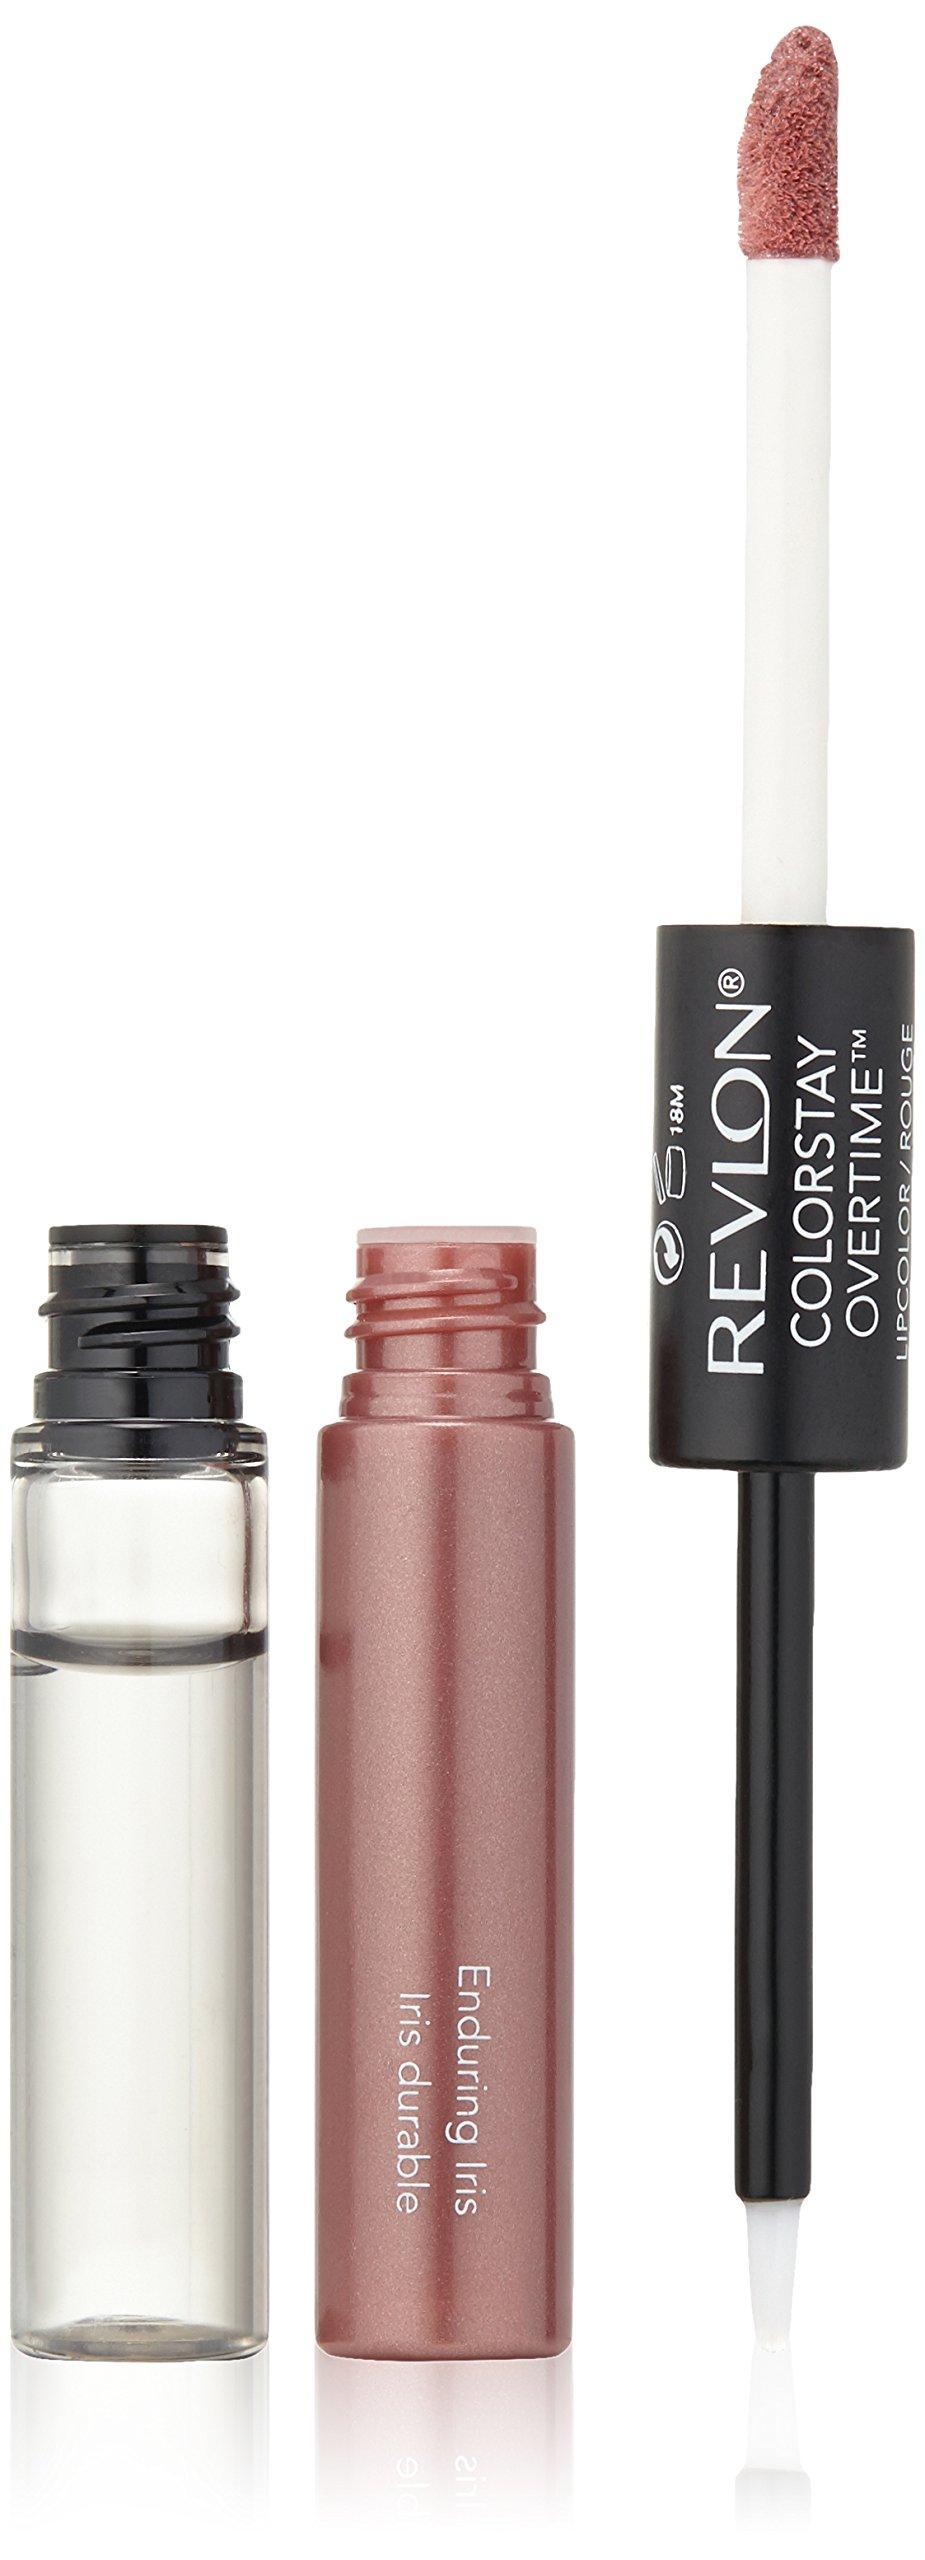 Revlon ColorStay Overtime Lipcolor, Enduring Iris